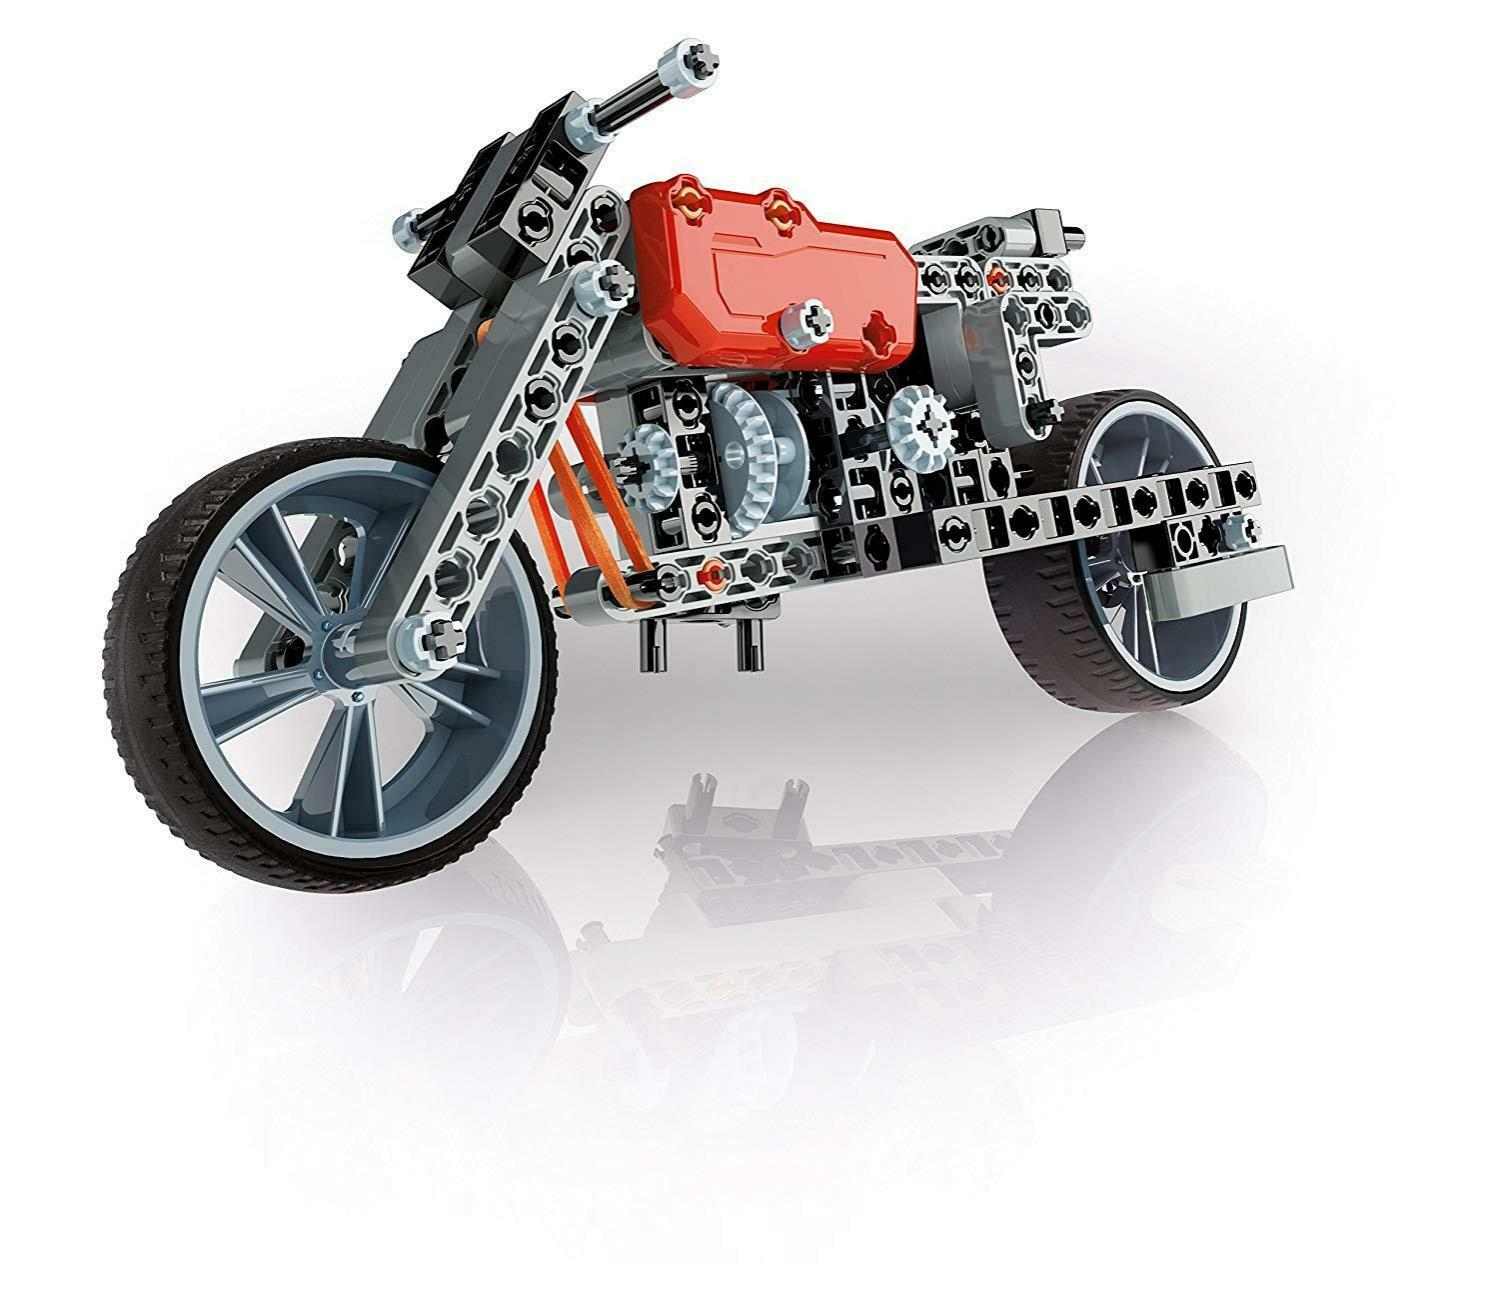 clementoni clementoni scienza & gioco - roadster & dragster 13969